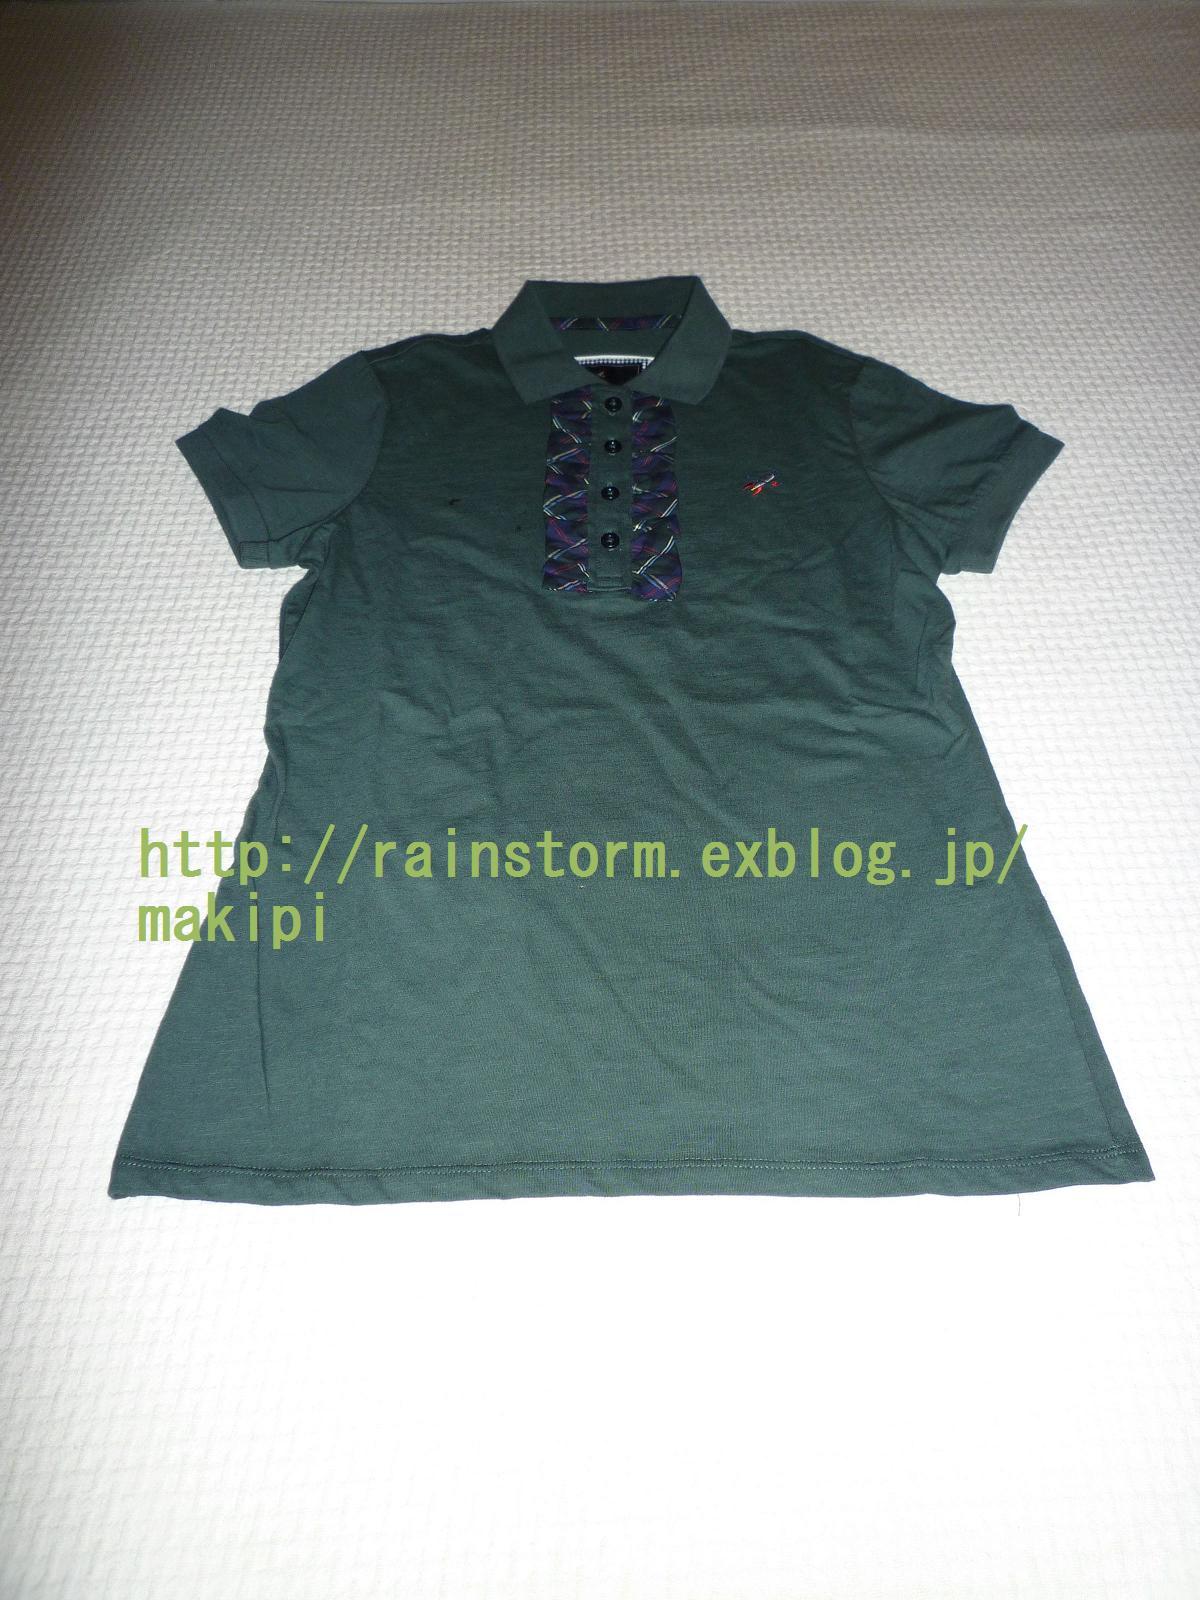 c0047605_10405099.jpg